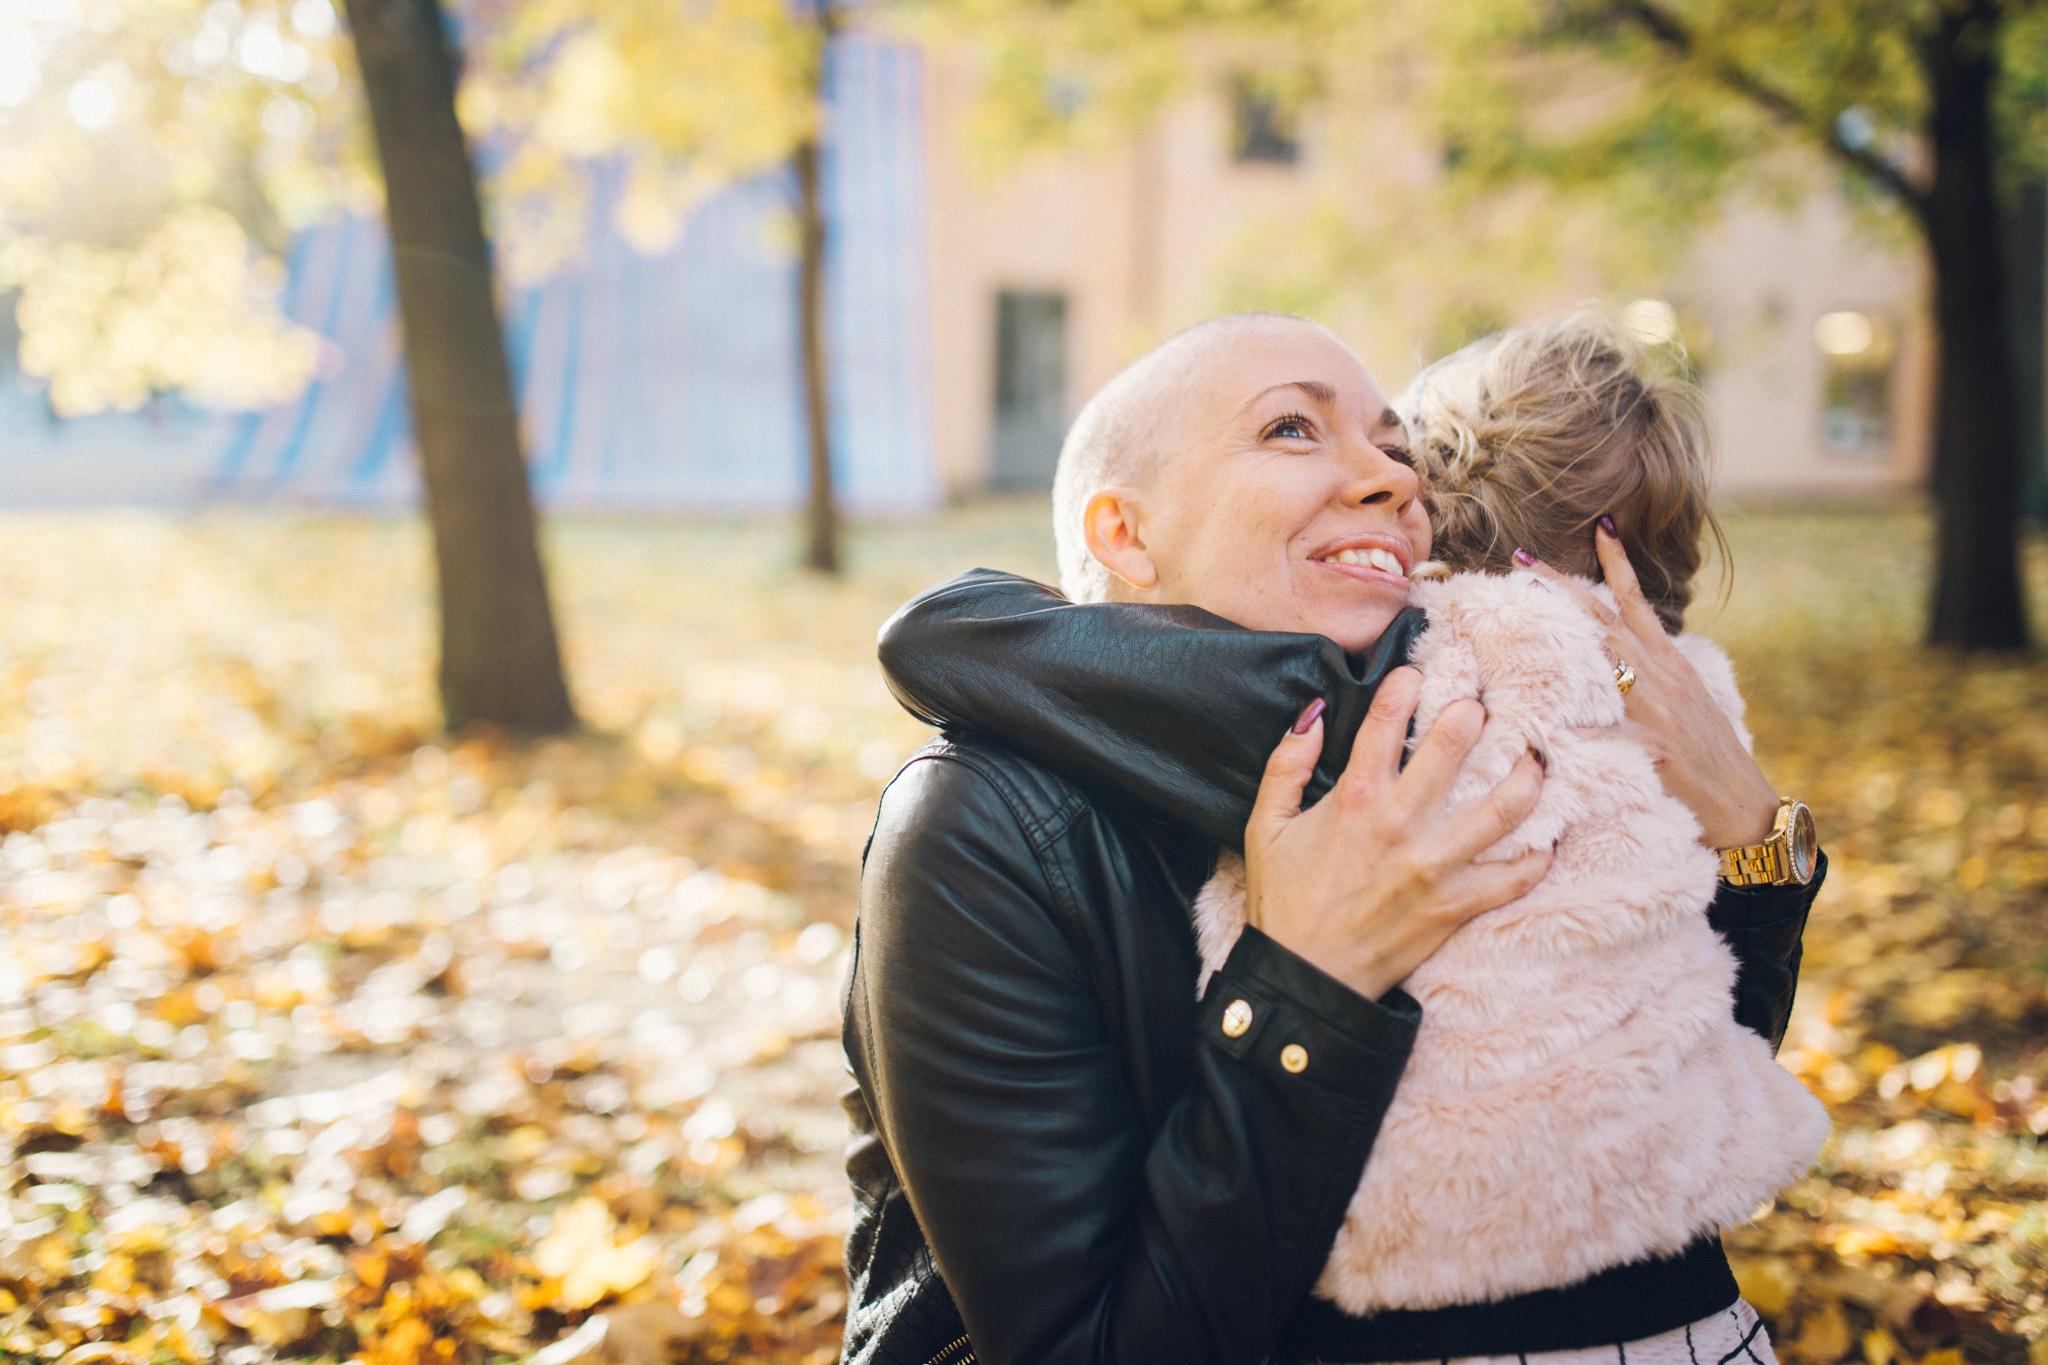 familjefotograf stockholm, familjefotograf vallentuna, familjefotograf täby, barnfotograf stockholm, familjebilder, familjefotografering stockholm, studiofotograf, linda rehlin, cecilia pihl, caroline norlin,